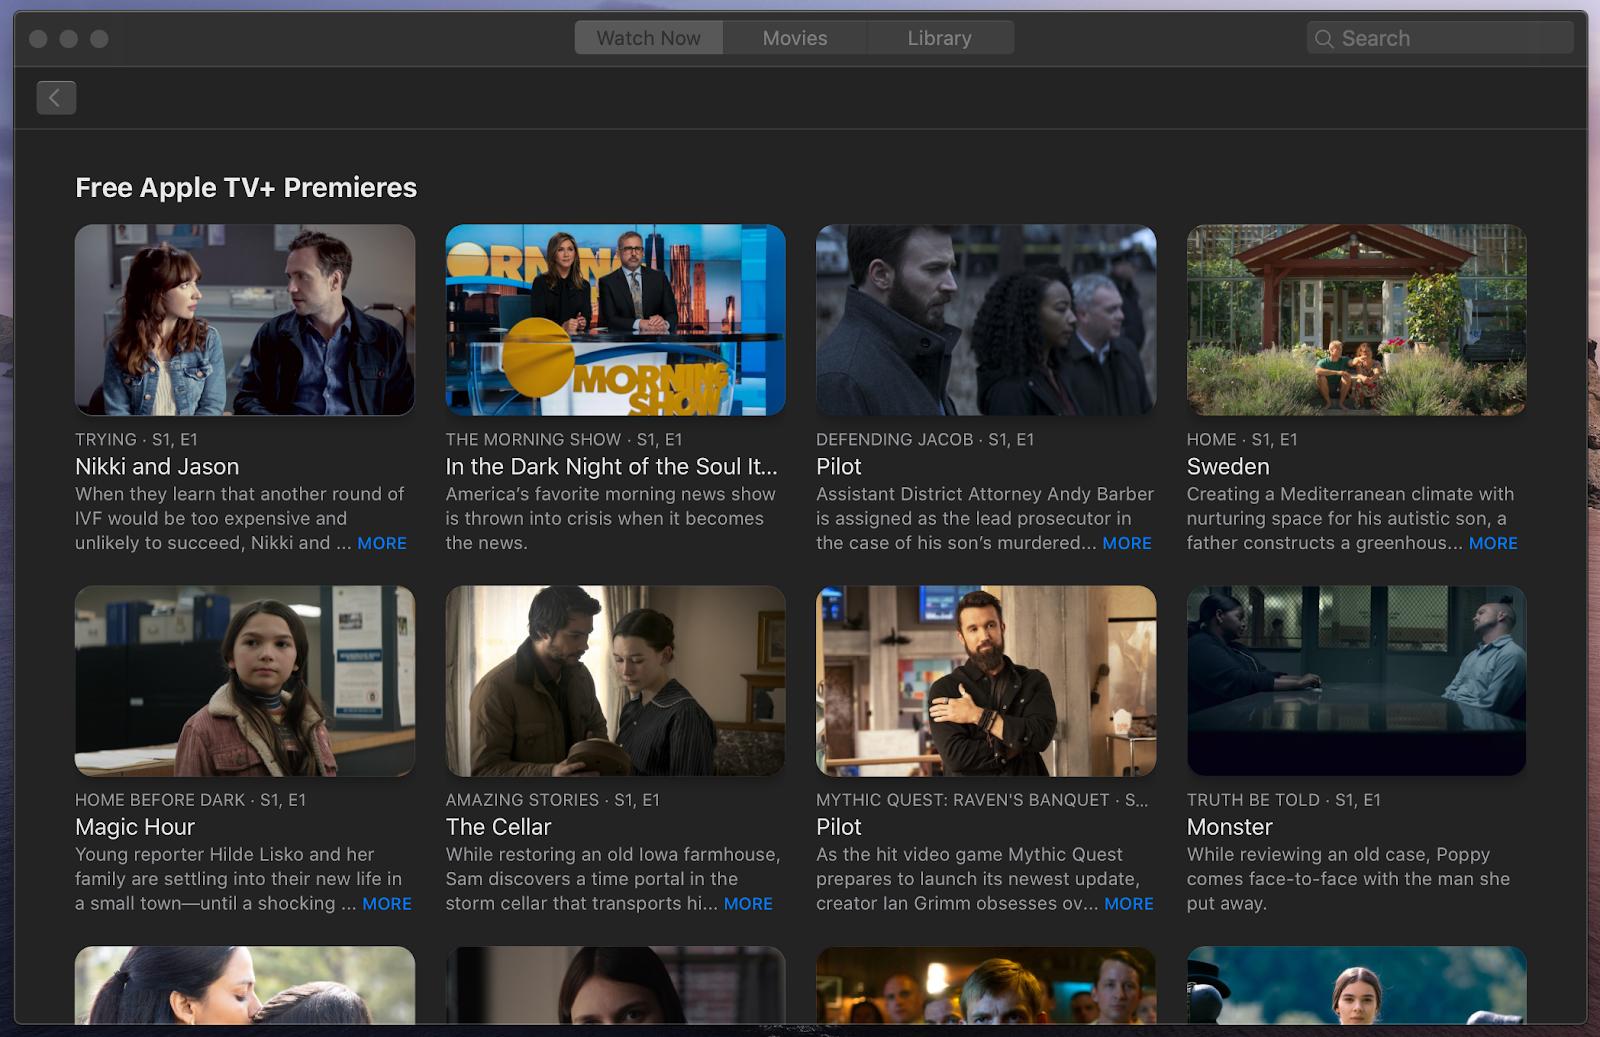 free Apple TV+ shows